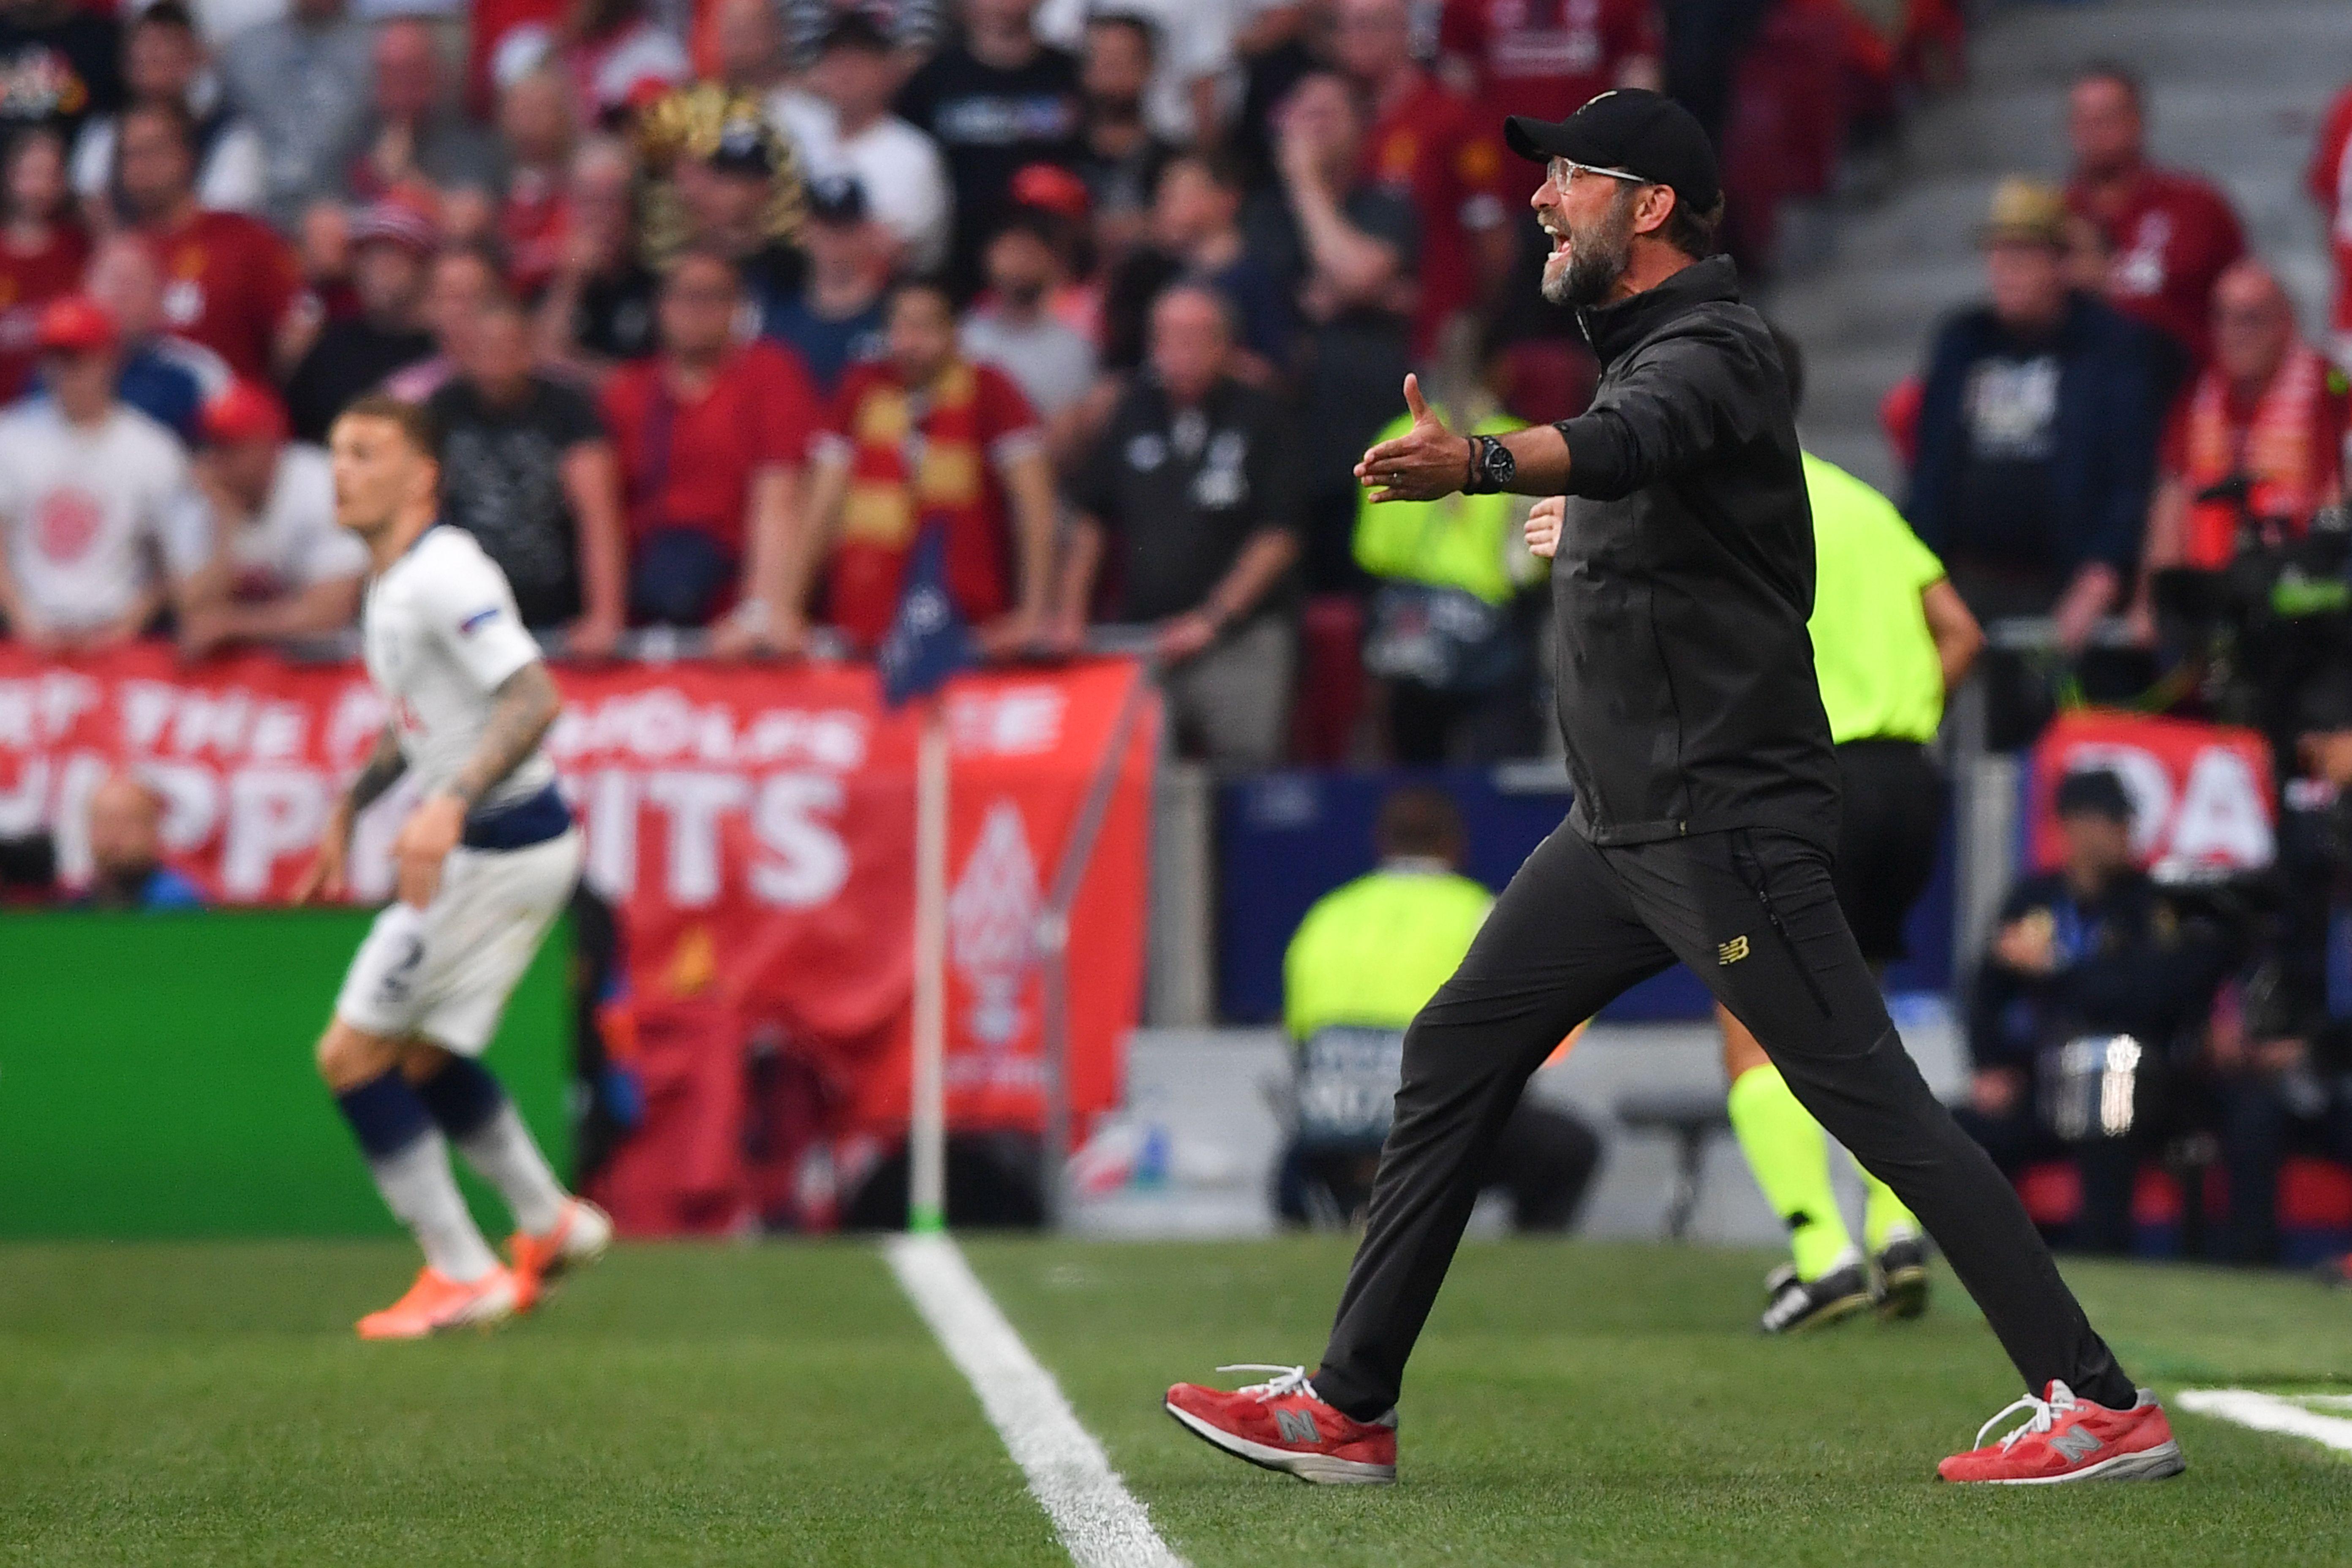 Jurgen Klopp Tottenham 0-2 Liverpool Champions League Final 2018/2019